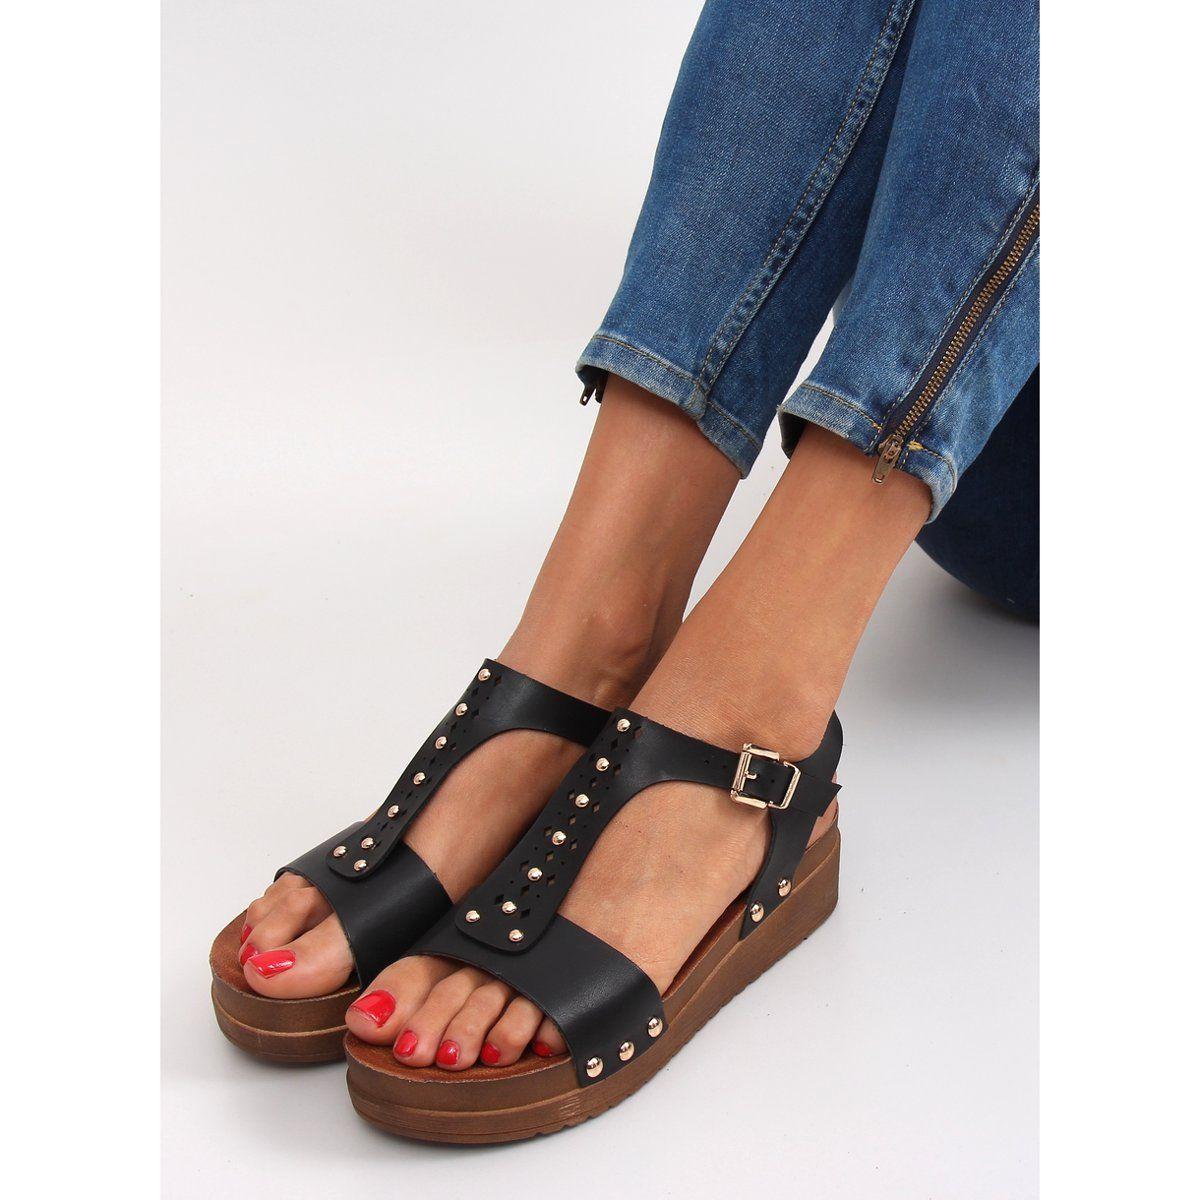 Sandalki Na Grubej Podeszwie 568 5 Black Czarne Shoes Sandals Birkenstock